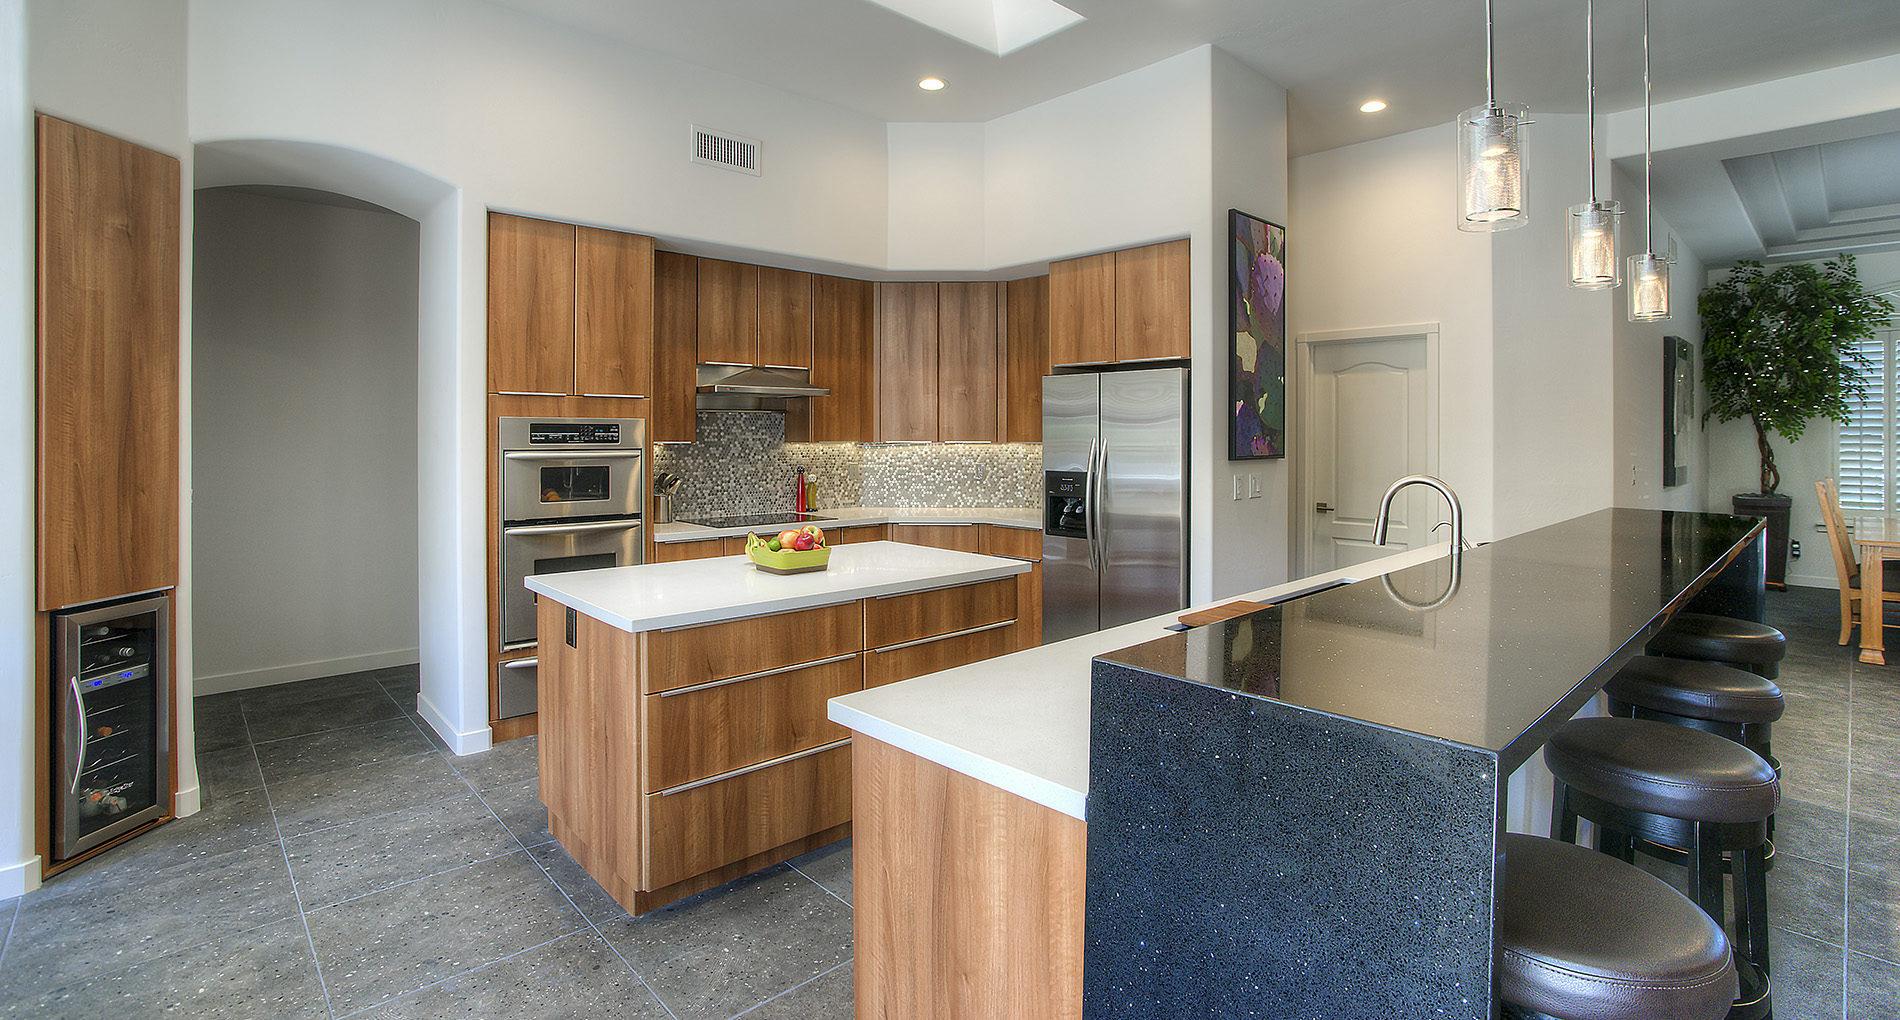 Kitchen remodel paradisevalley 18thstreet slider